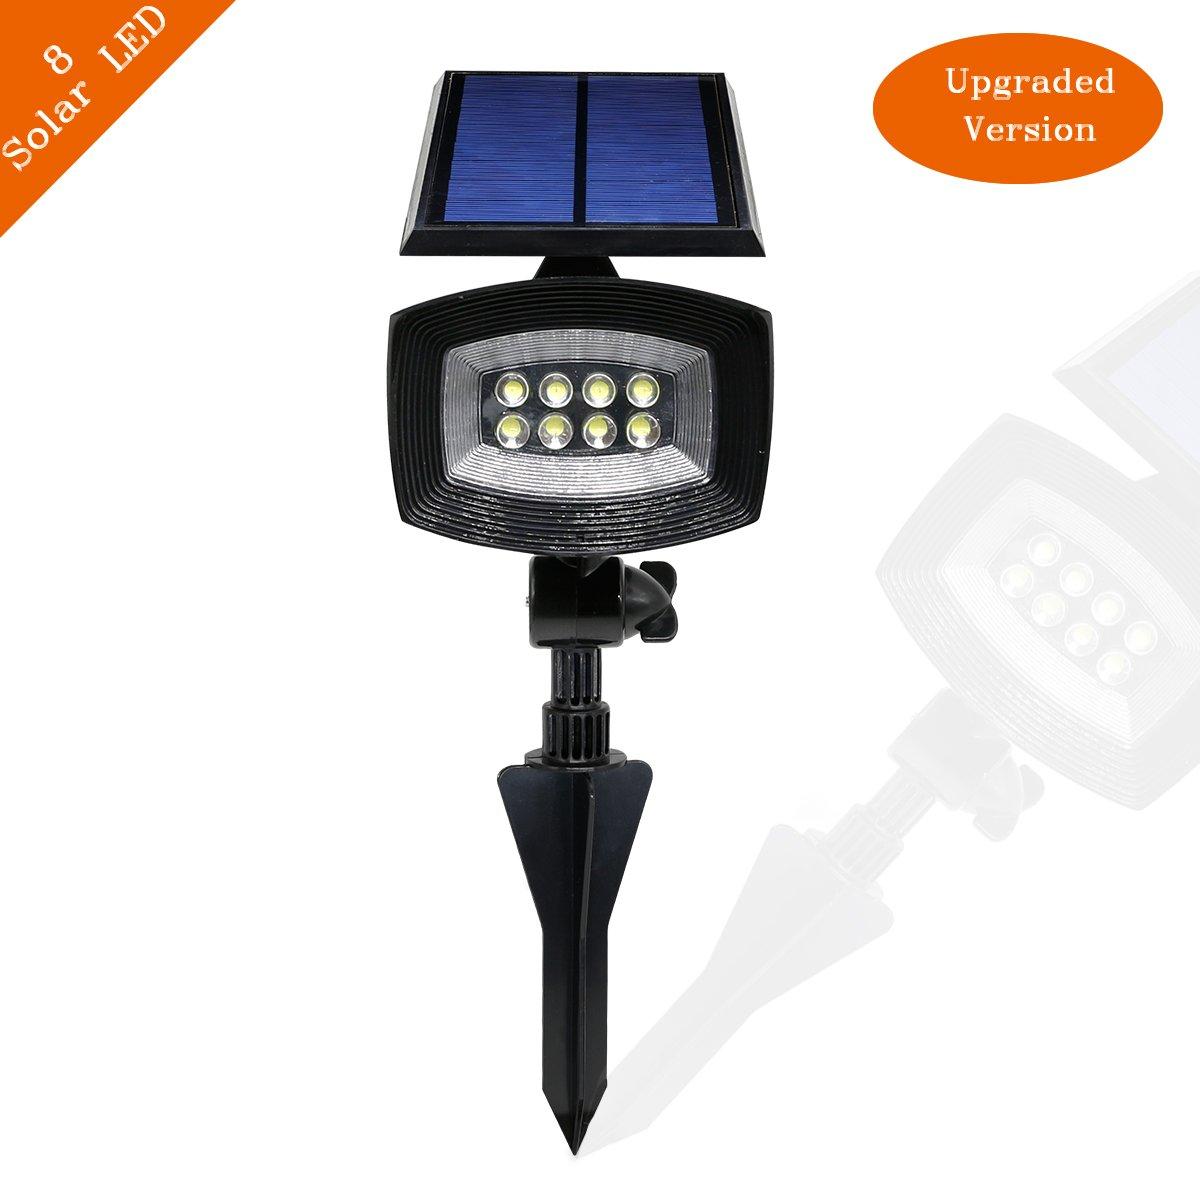 Amazon.com : Solar Lights, APOLLED 400 Lumens Adjustable Waterproof ...